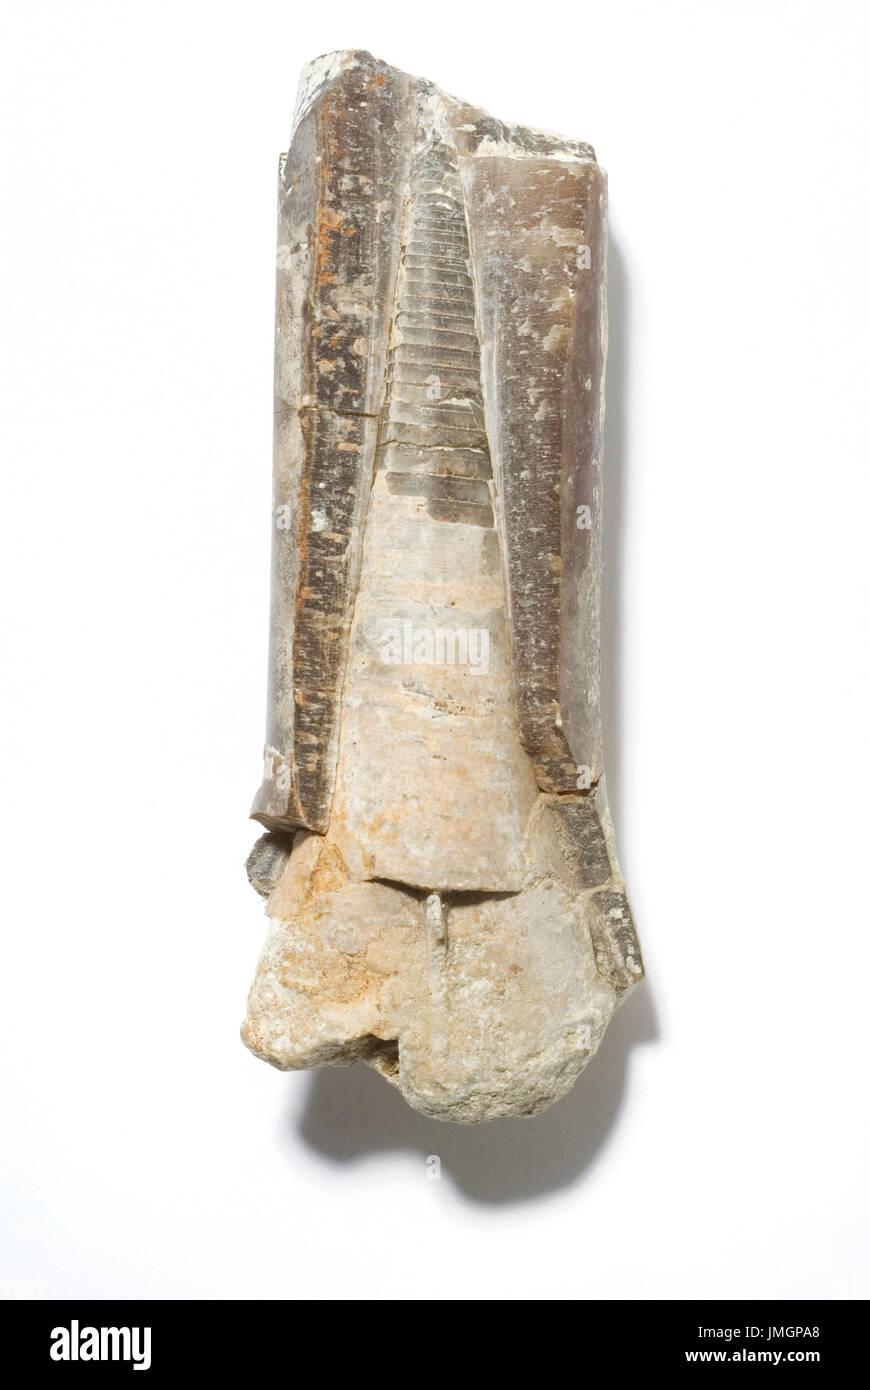 Fossil Belemnite Phragmocone - Stock Image